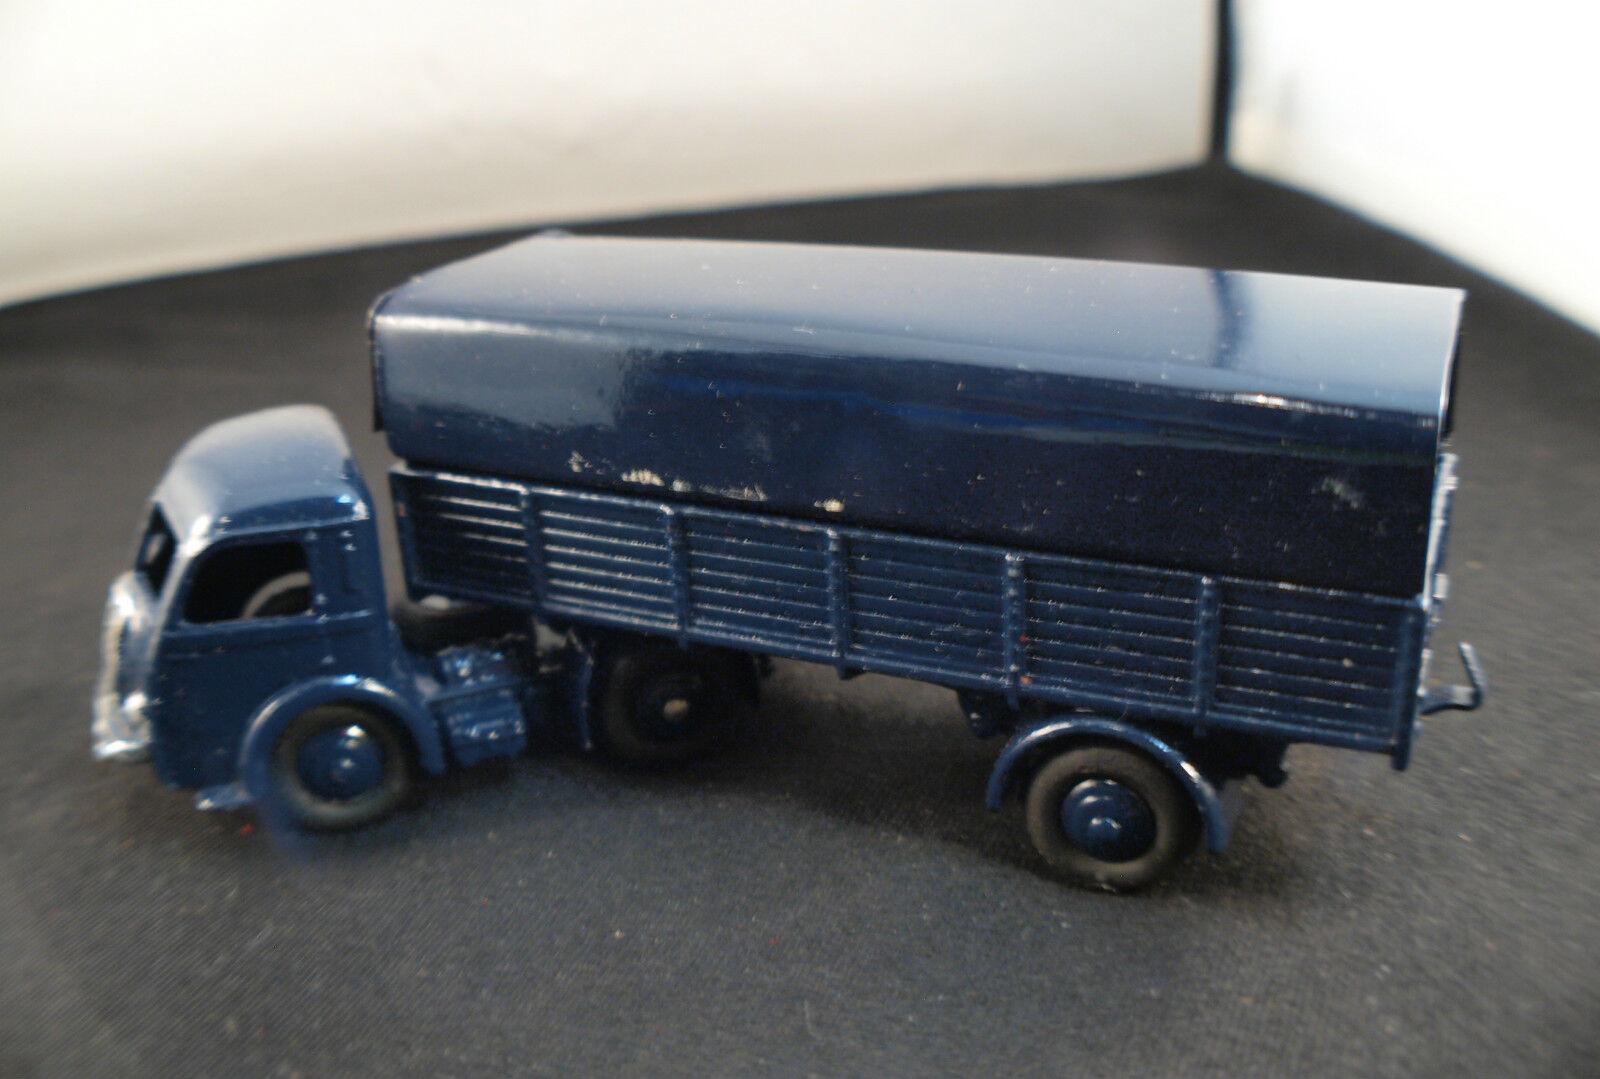 Dinky Toys F n° 32AB Panhard semi-remorque SNCF repeint